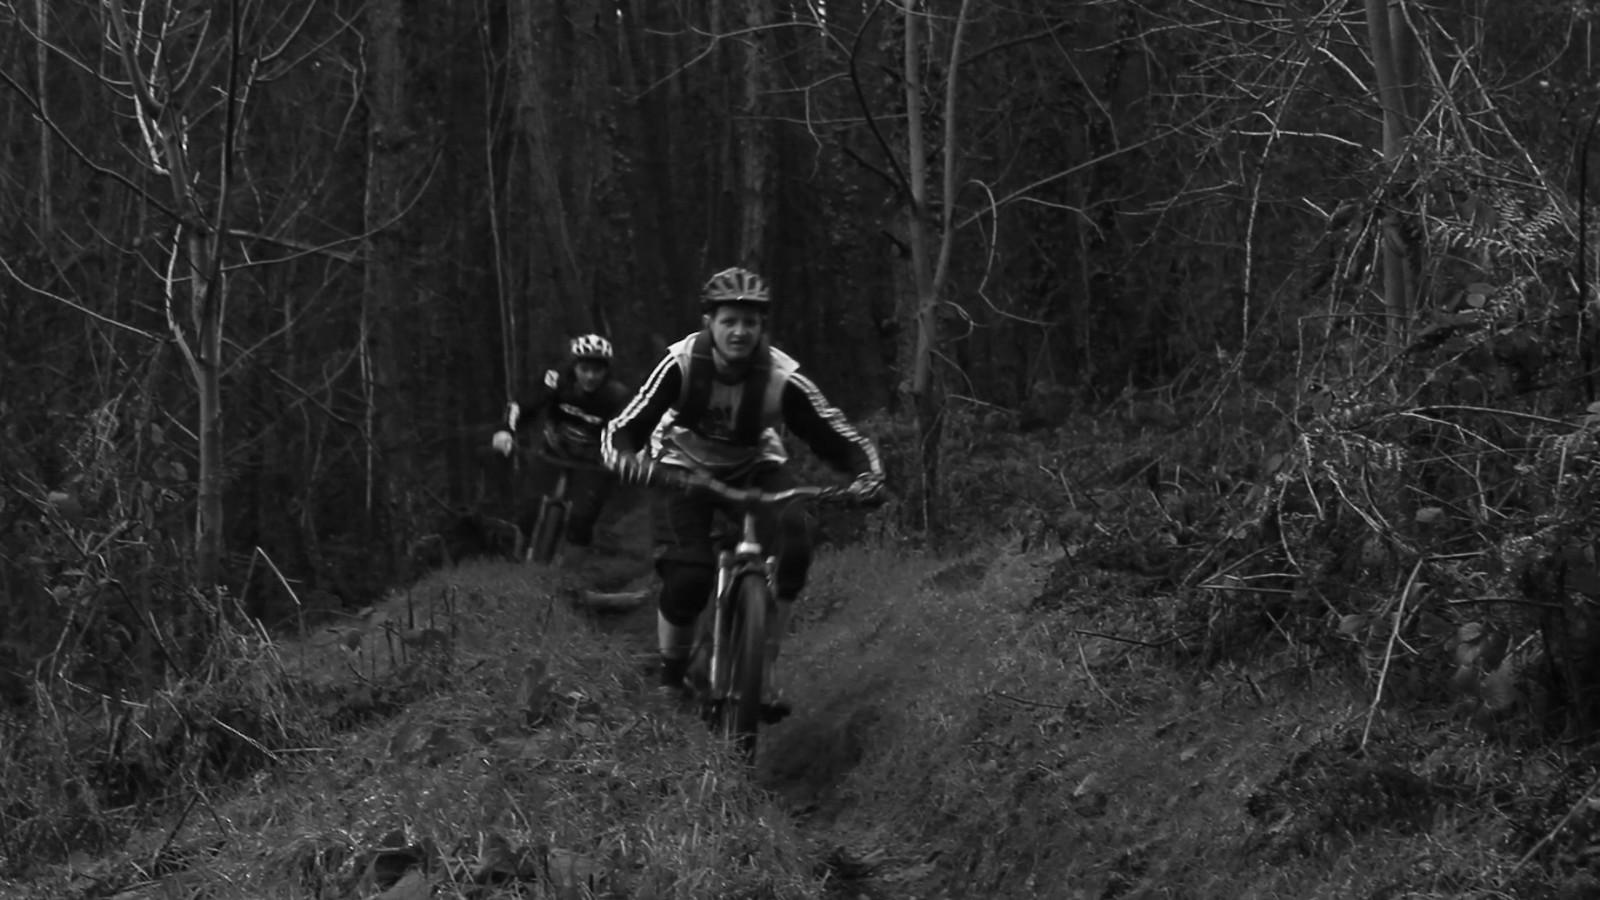 The Milk Run - Matthew Davies - Mountain Biking Pictures - Vital MTB